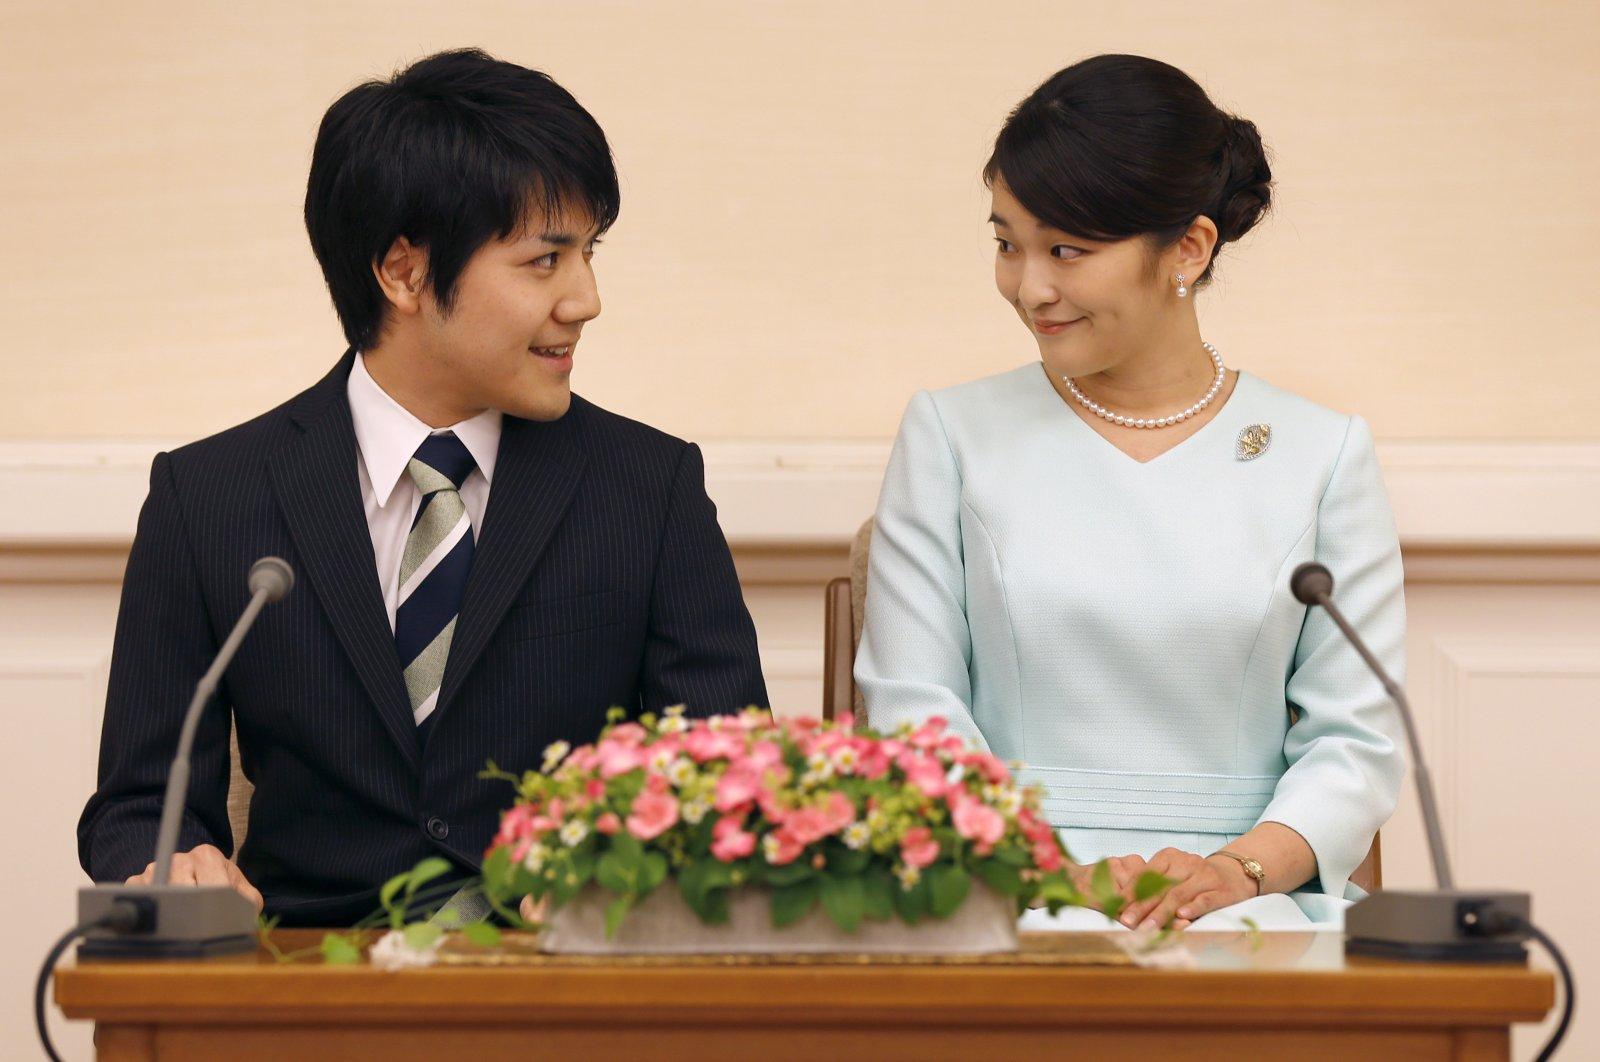 Japanese Princess Mako (R), the eldest daughter of Crown Prince Akishino and Crown Princess Kiko, and her fiancee Kei Komuro (L), a university friend, smile during a press conference to announce their engagement at Akasaka East Residence in Tokyo, Japan, Sep.3, 2017. (EPA/SHIZUO KAMBAYASHI Photo)